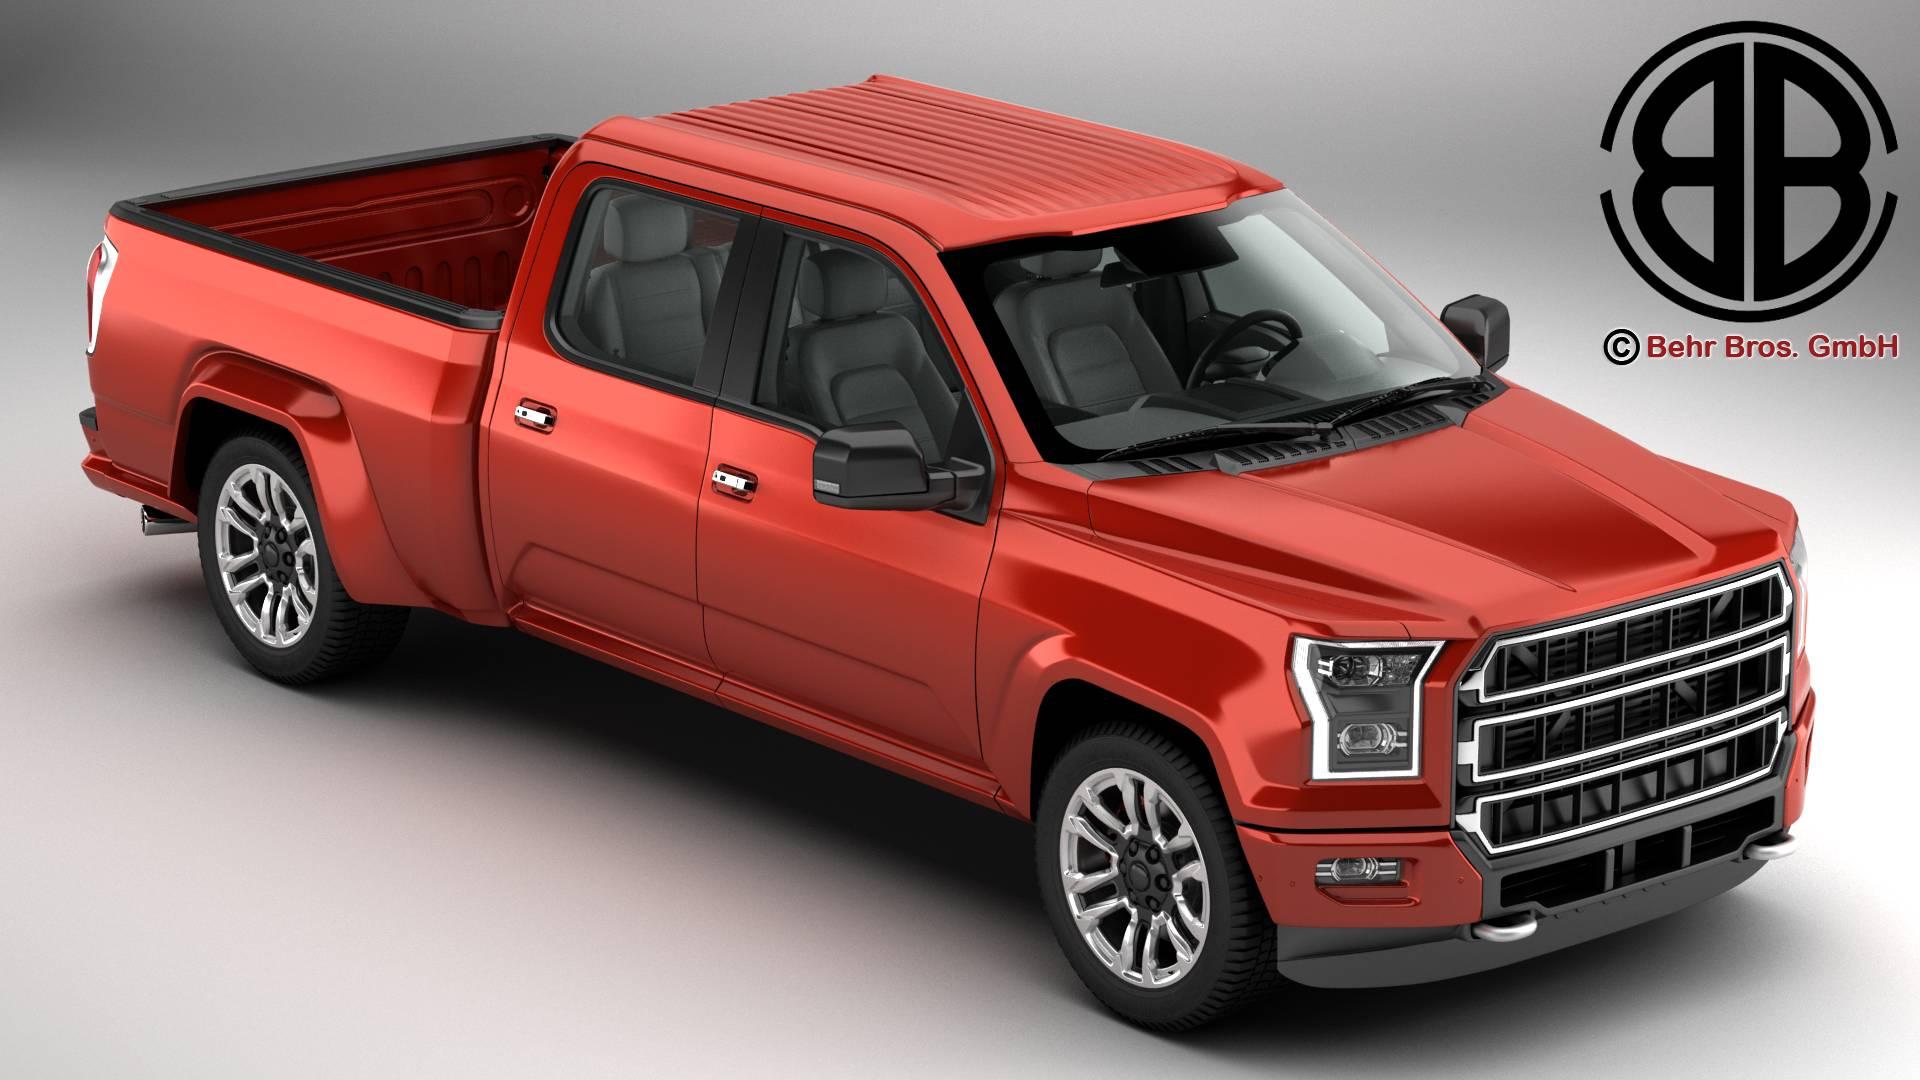 generic pickup 3d model 3ds max fbx c4d lwo ma mb obj 219867